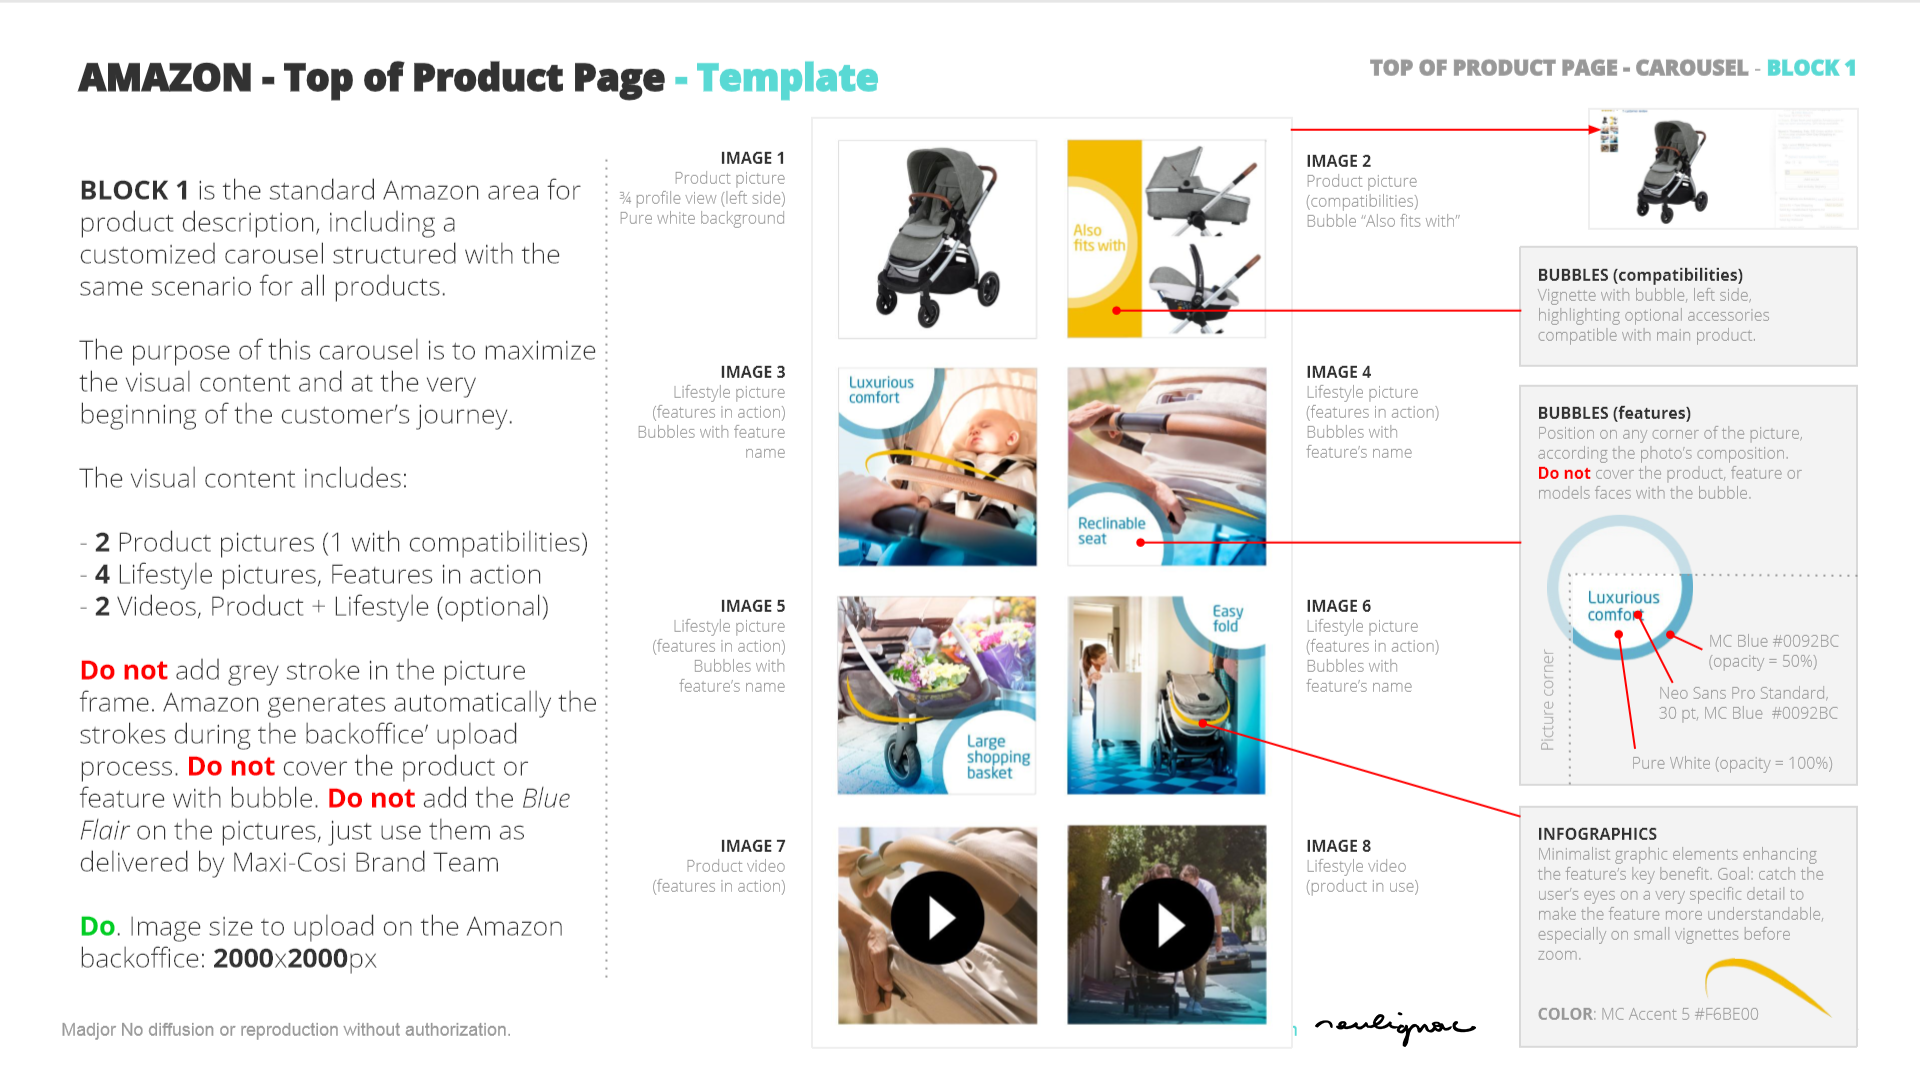 Maxi-Cosi China - Dorel Juvenile - Digital Guidelines - AMAZON Product page - Francois Soulignac, Documents  & Art Direction - MADJOR Labbrand Shanghai, China